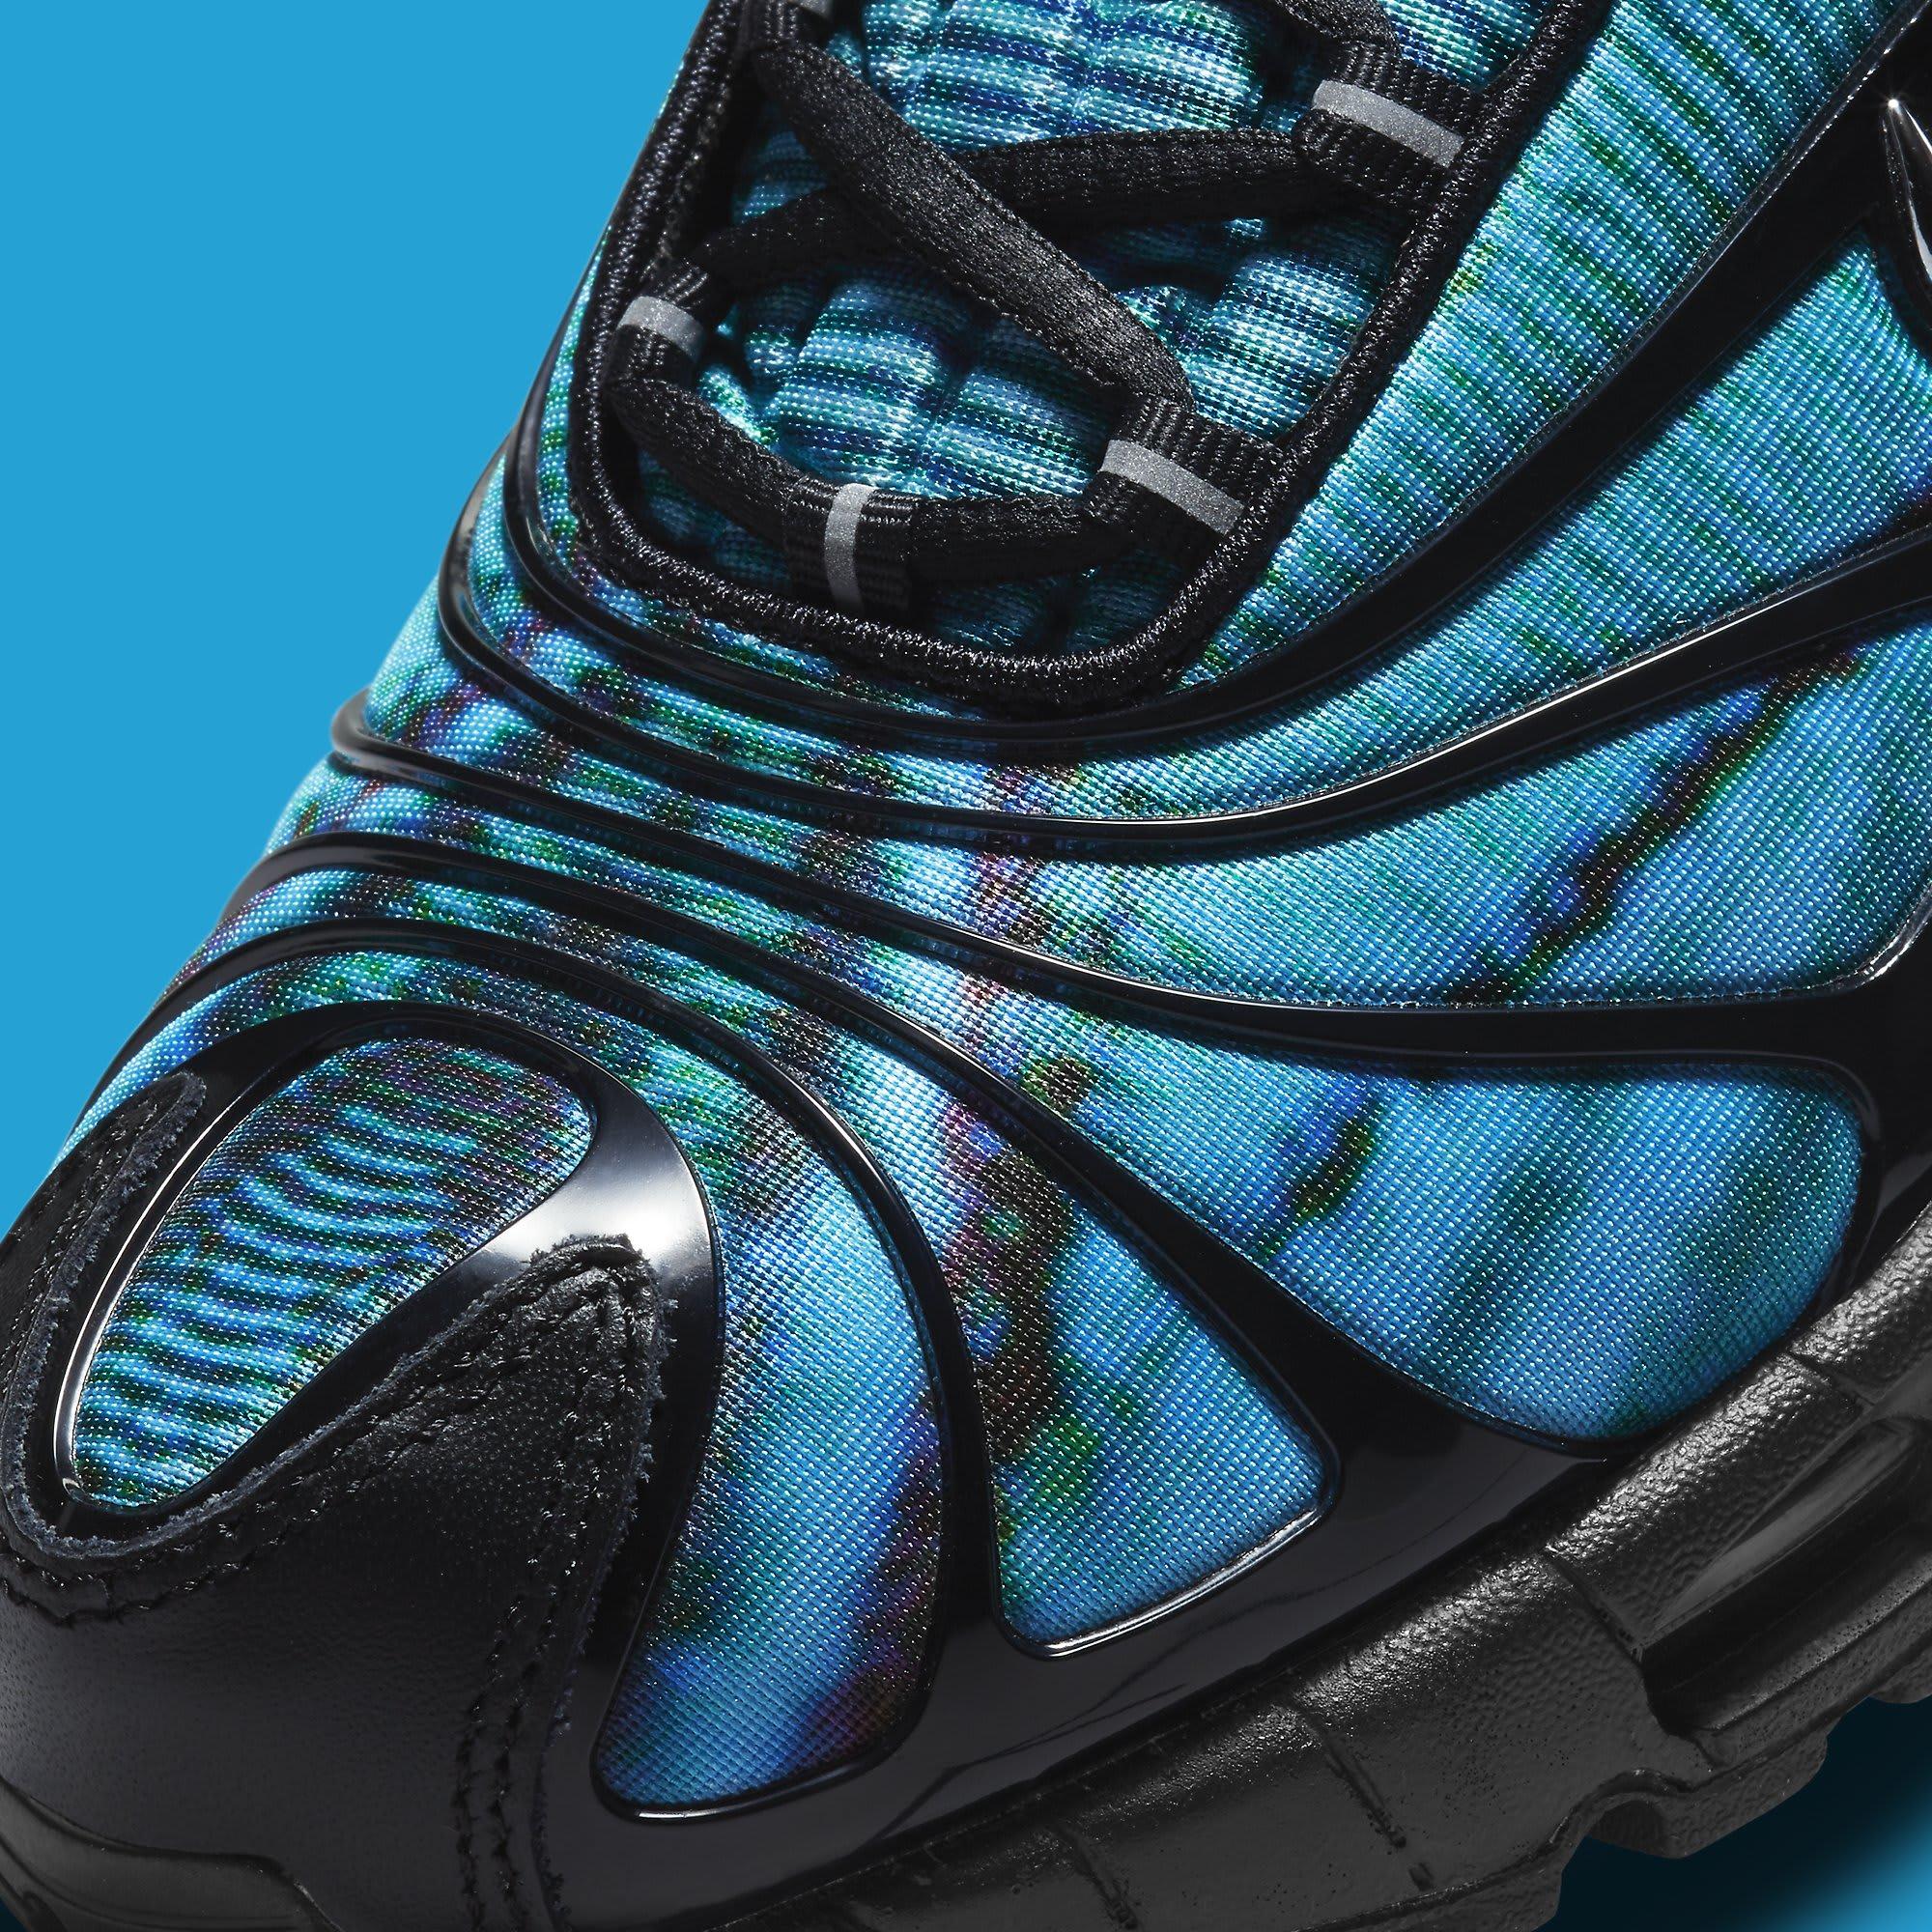 Skepta x Nike Air Tailwind V 'Blue' CQ8714-001 Toe